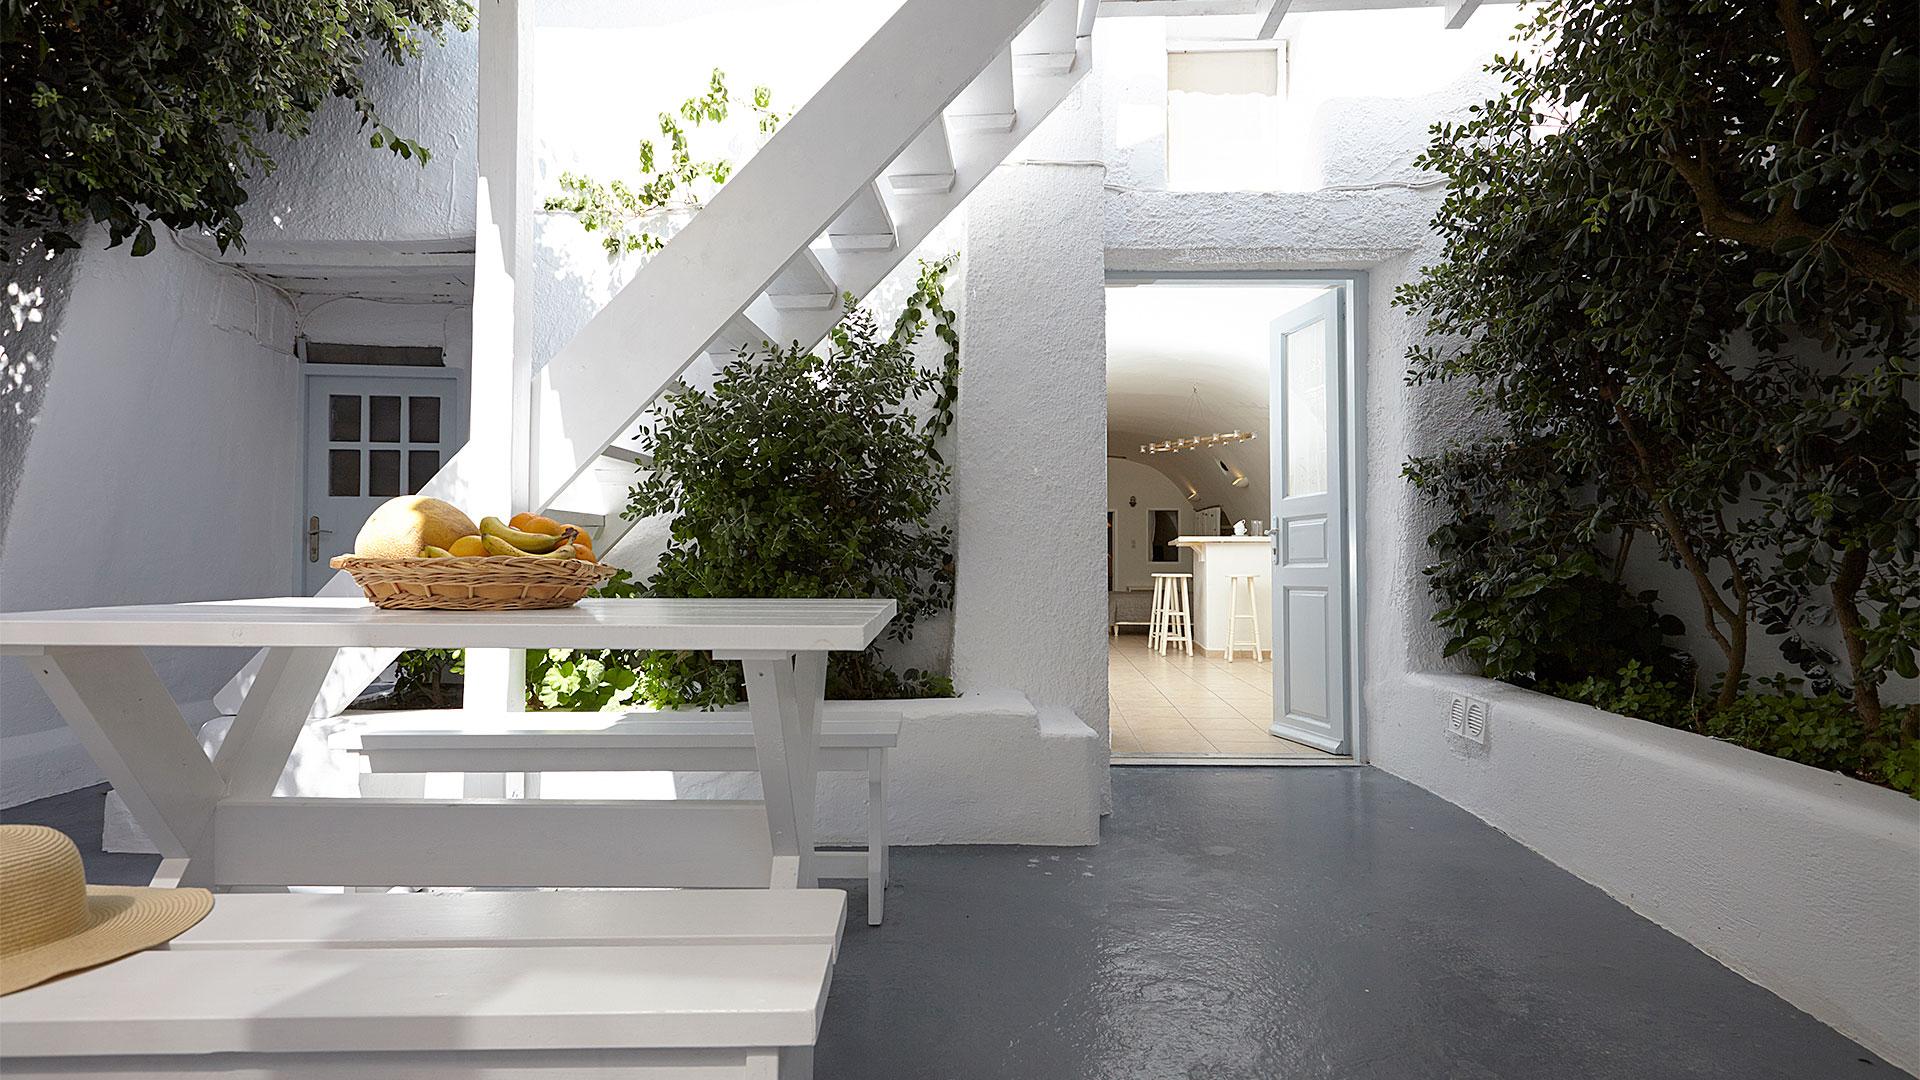 apartments Santorini with veranda special offers